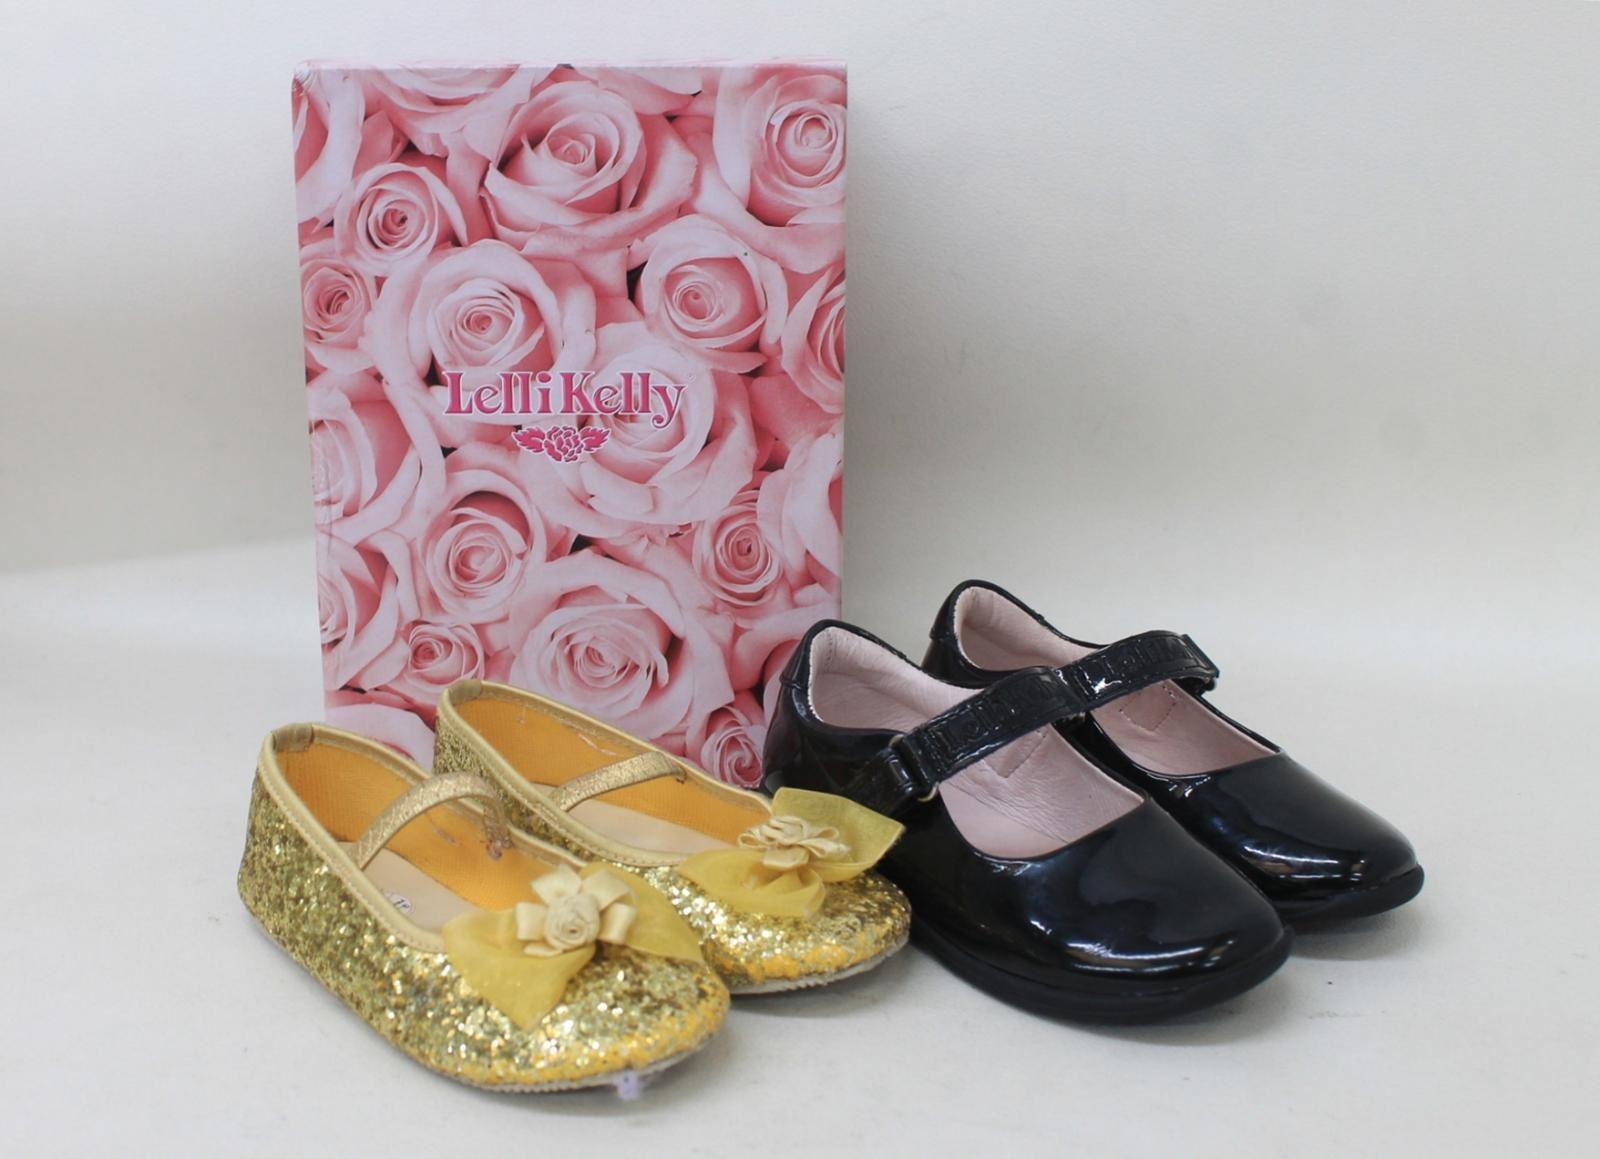 2-x-Girls-Gold-amp-Patent-Black-Ballerinas-Mary-Jane-Flat-Shoes-Size-UK7-8-EU26